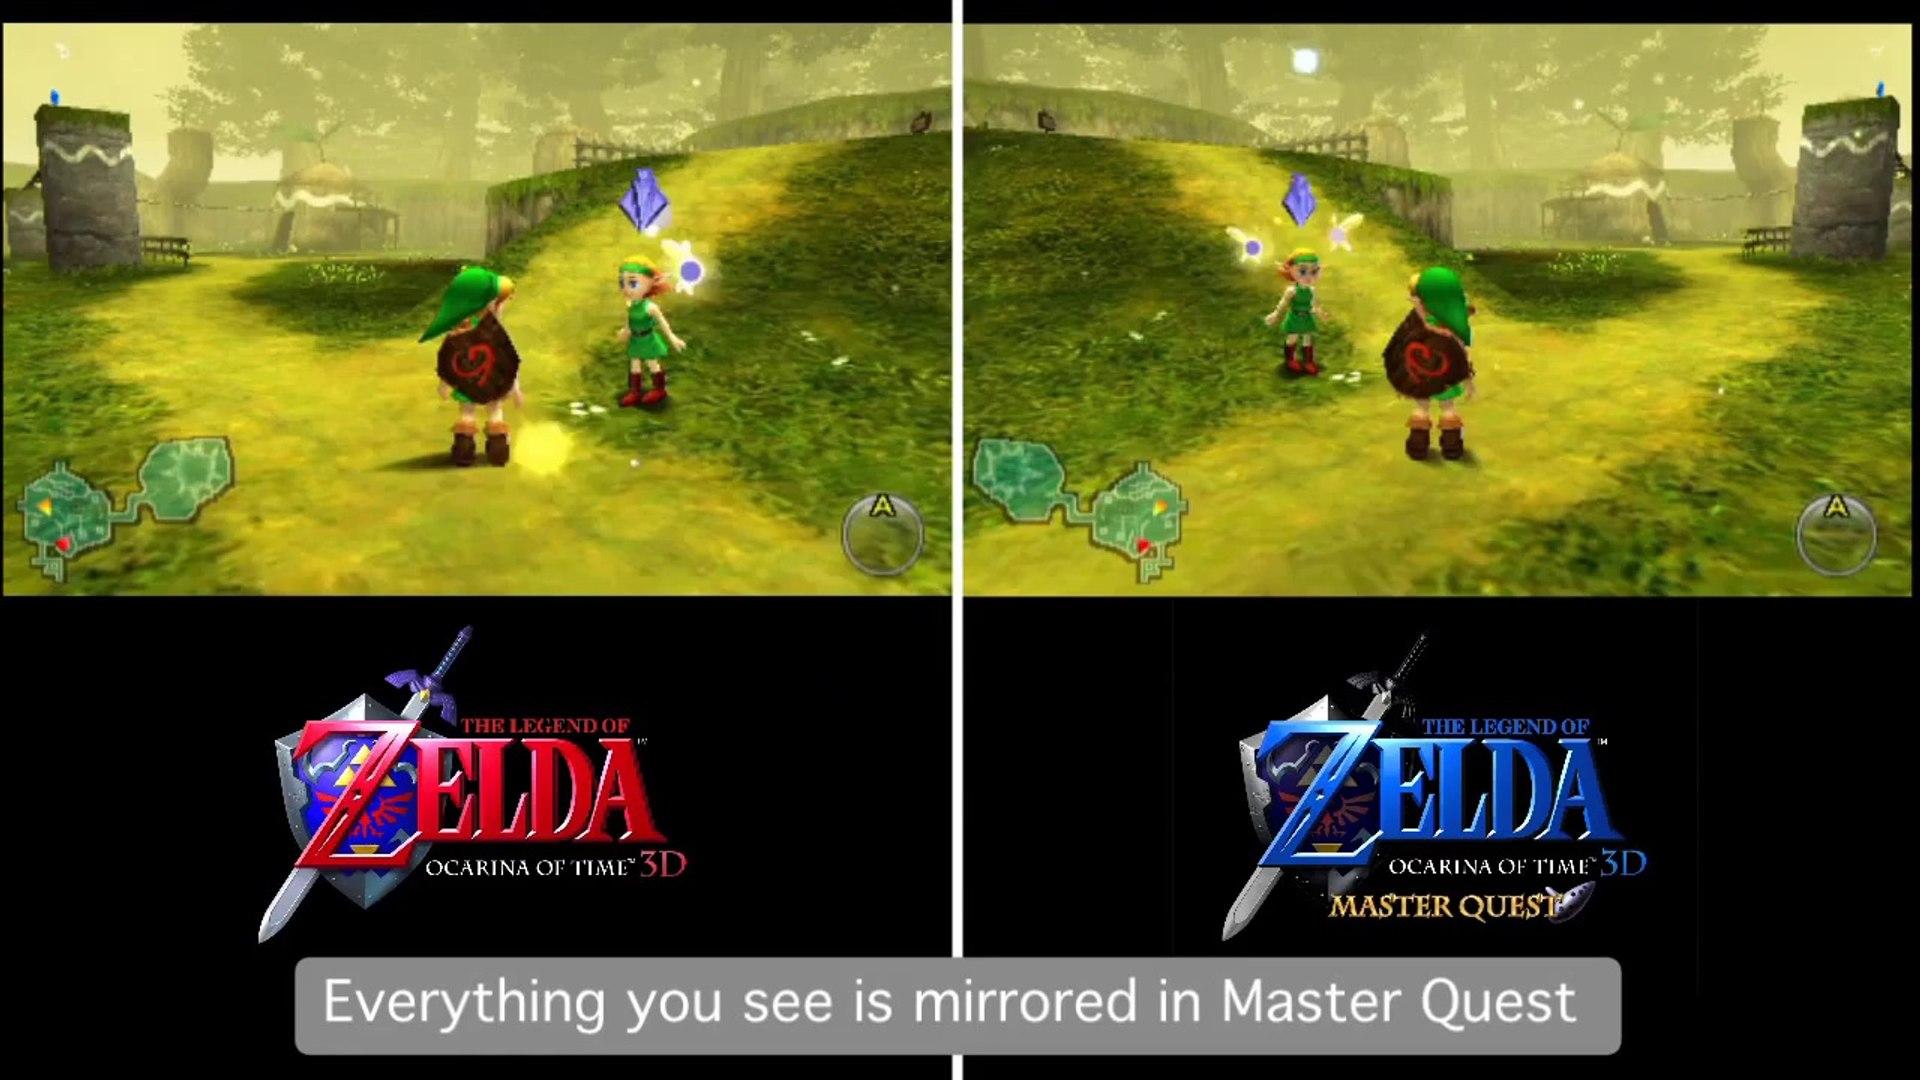 The Legend Of Zelda Ocarina Of Time 3d Master Quest Trailer